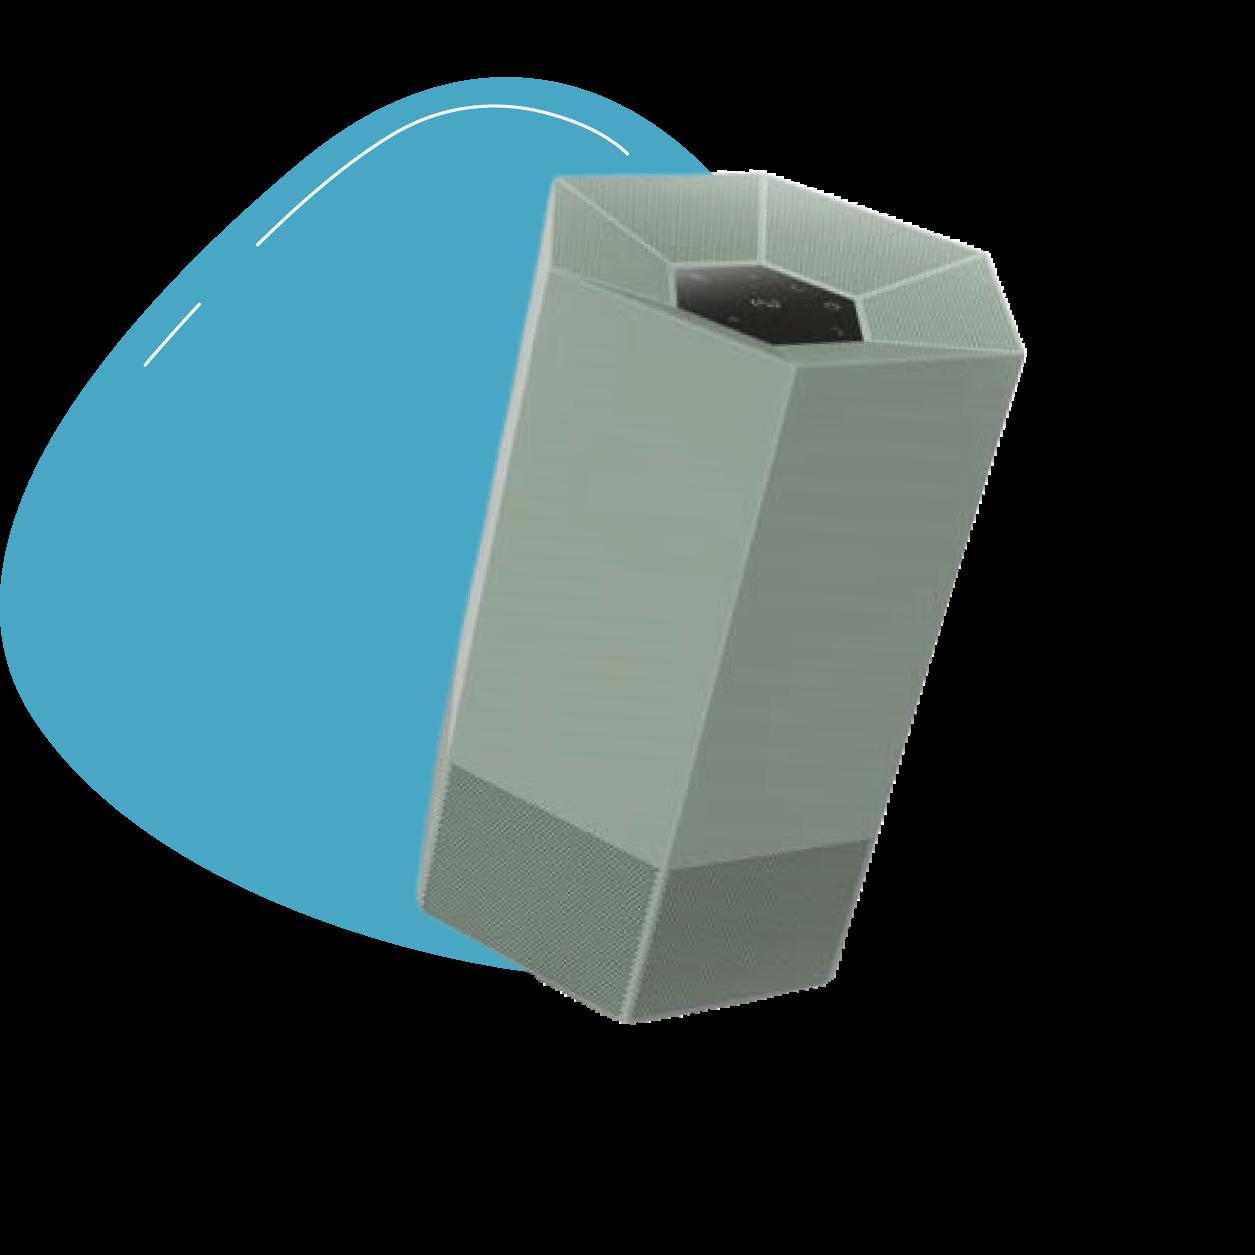 Purificateur d'air shield